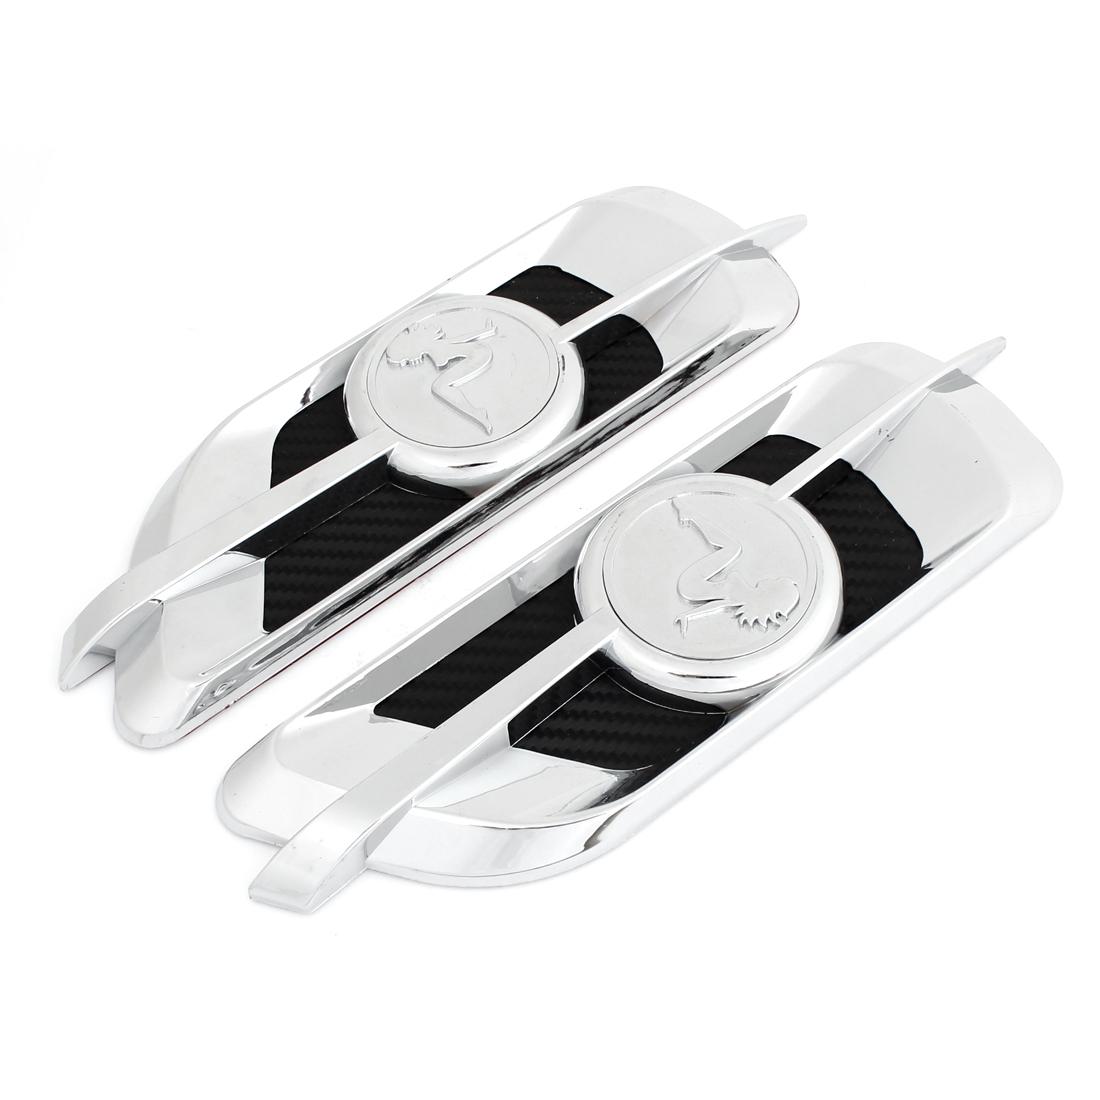 2PCS Vehicle Car Air Vent Fender 3D Sticker Ornament Silver Tone Black